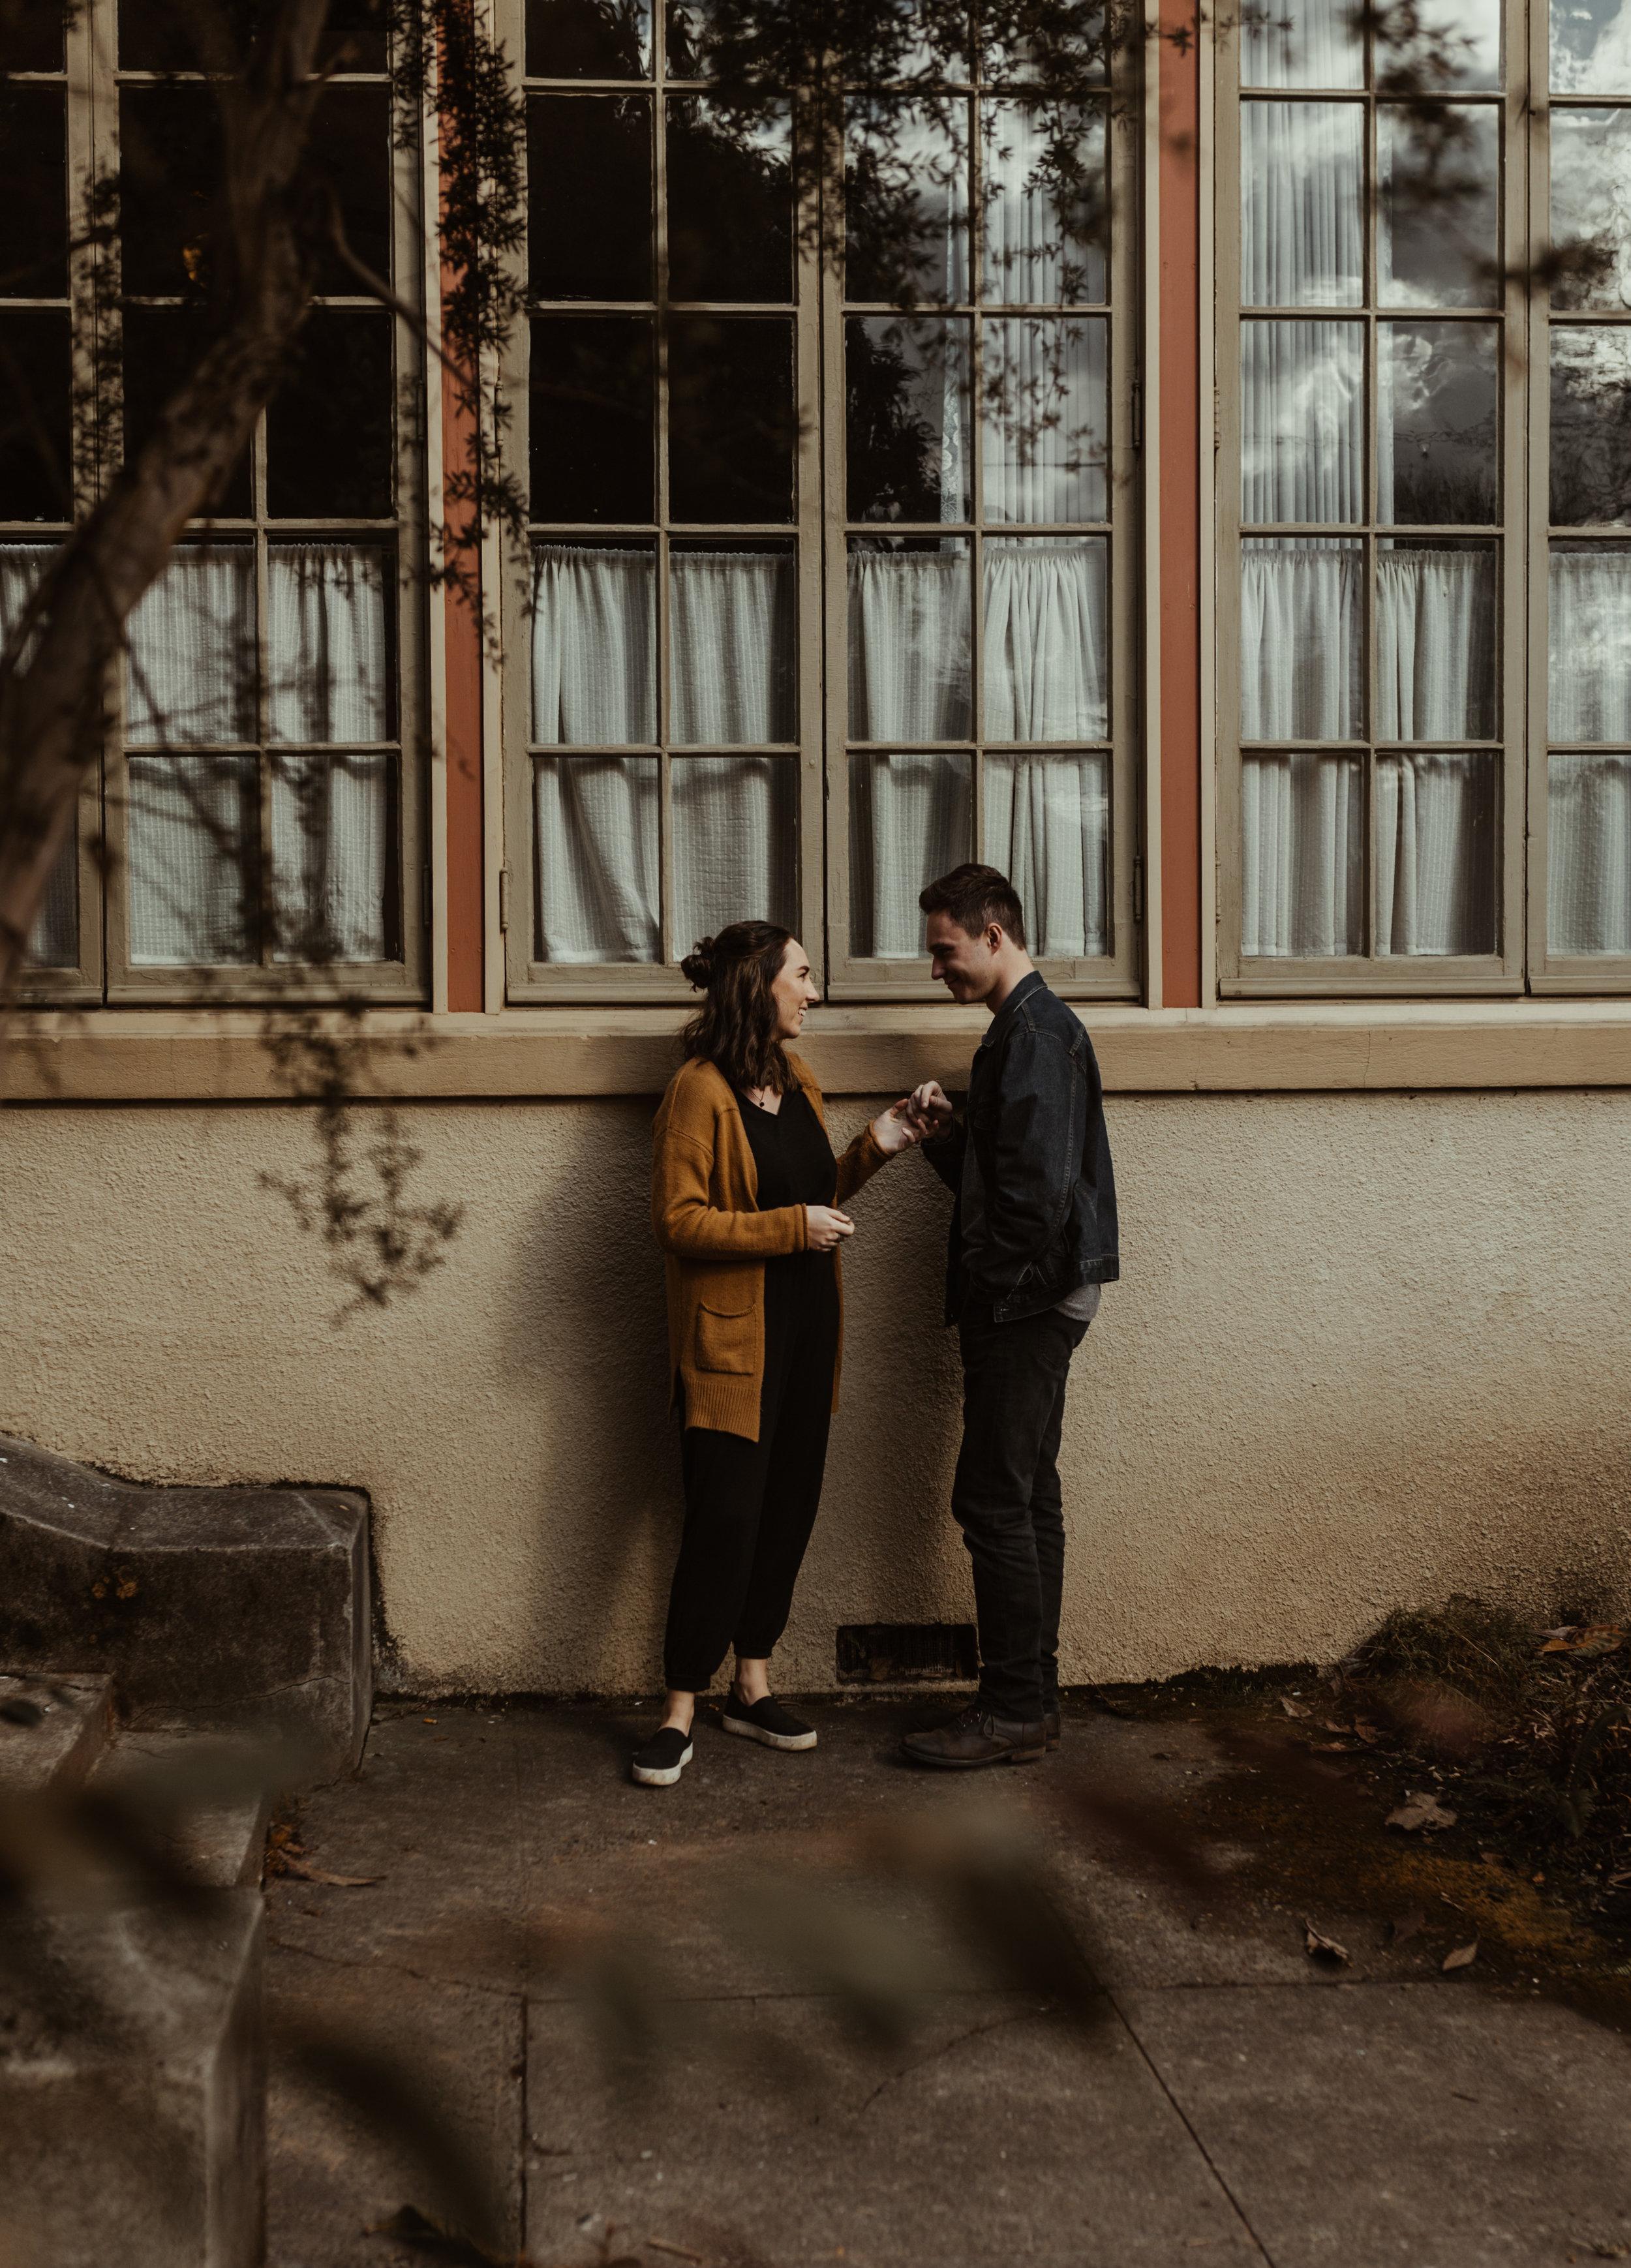 corrie&josiah_PortlandMcMenamins_CoupleShoot-21.jpg